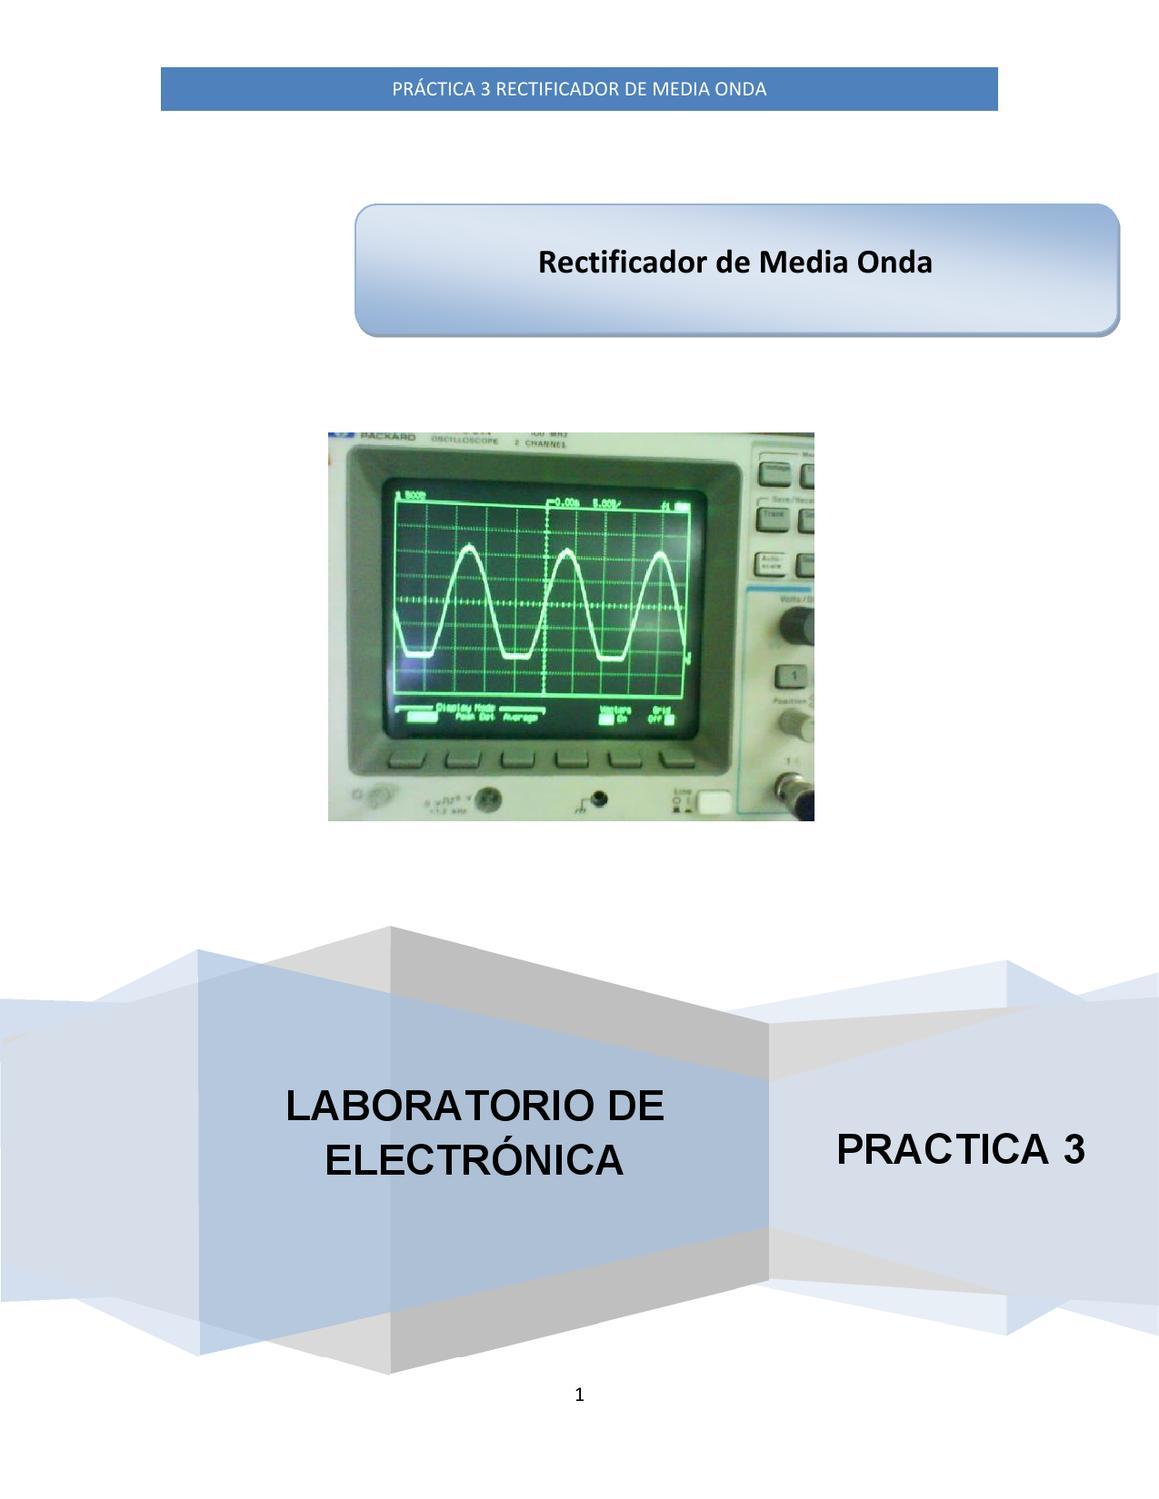 Circuito Rectificador De Media Onda : Practica rectificador de media onda by gerson villa